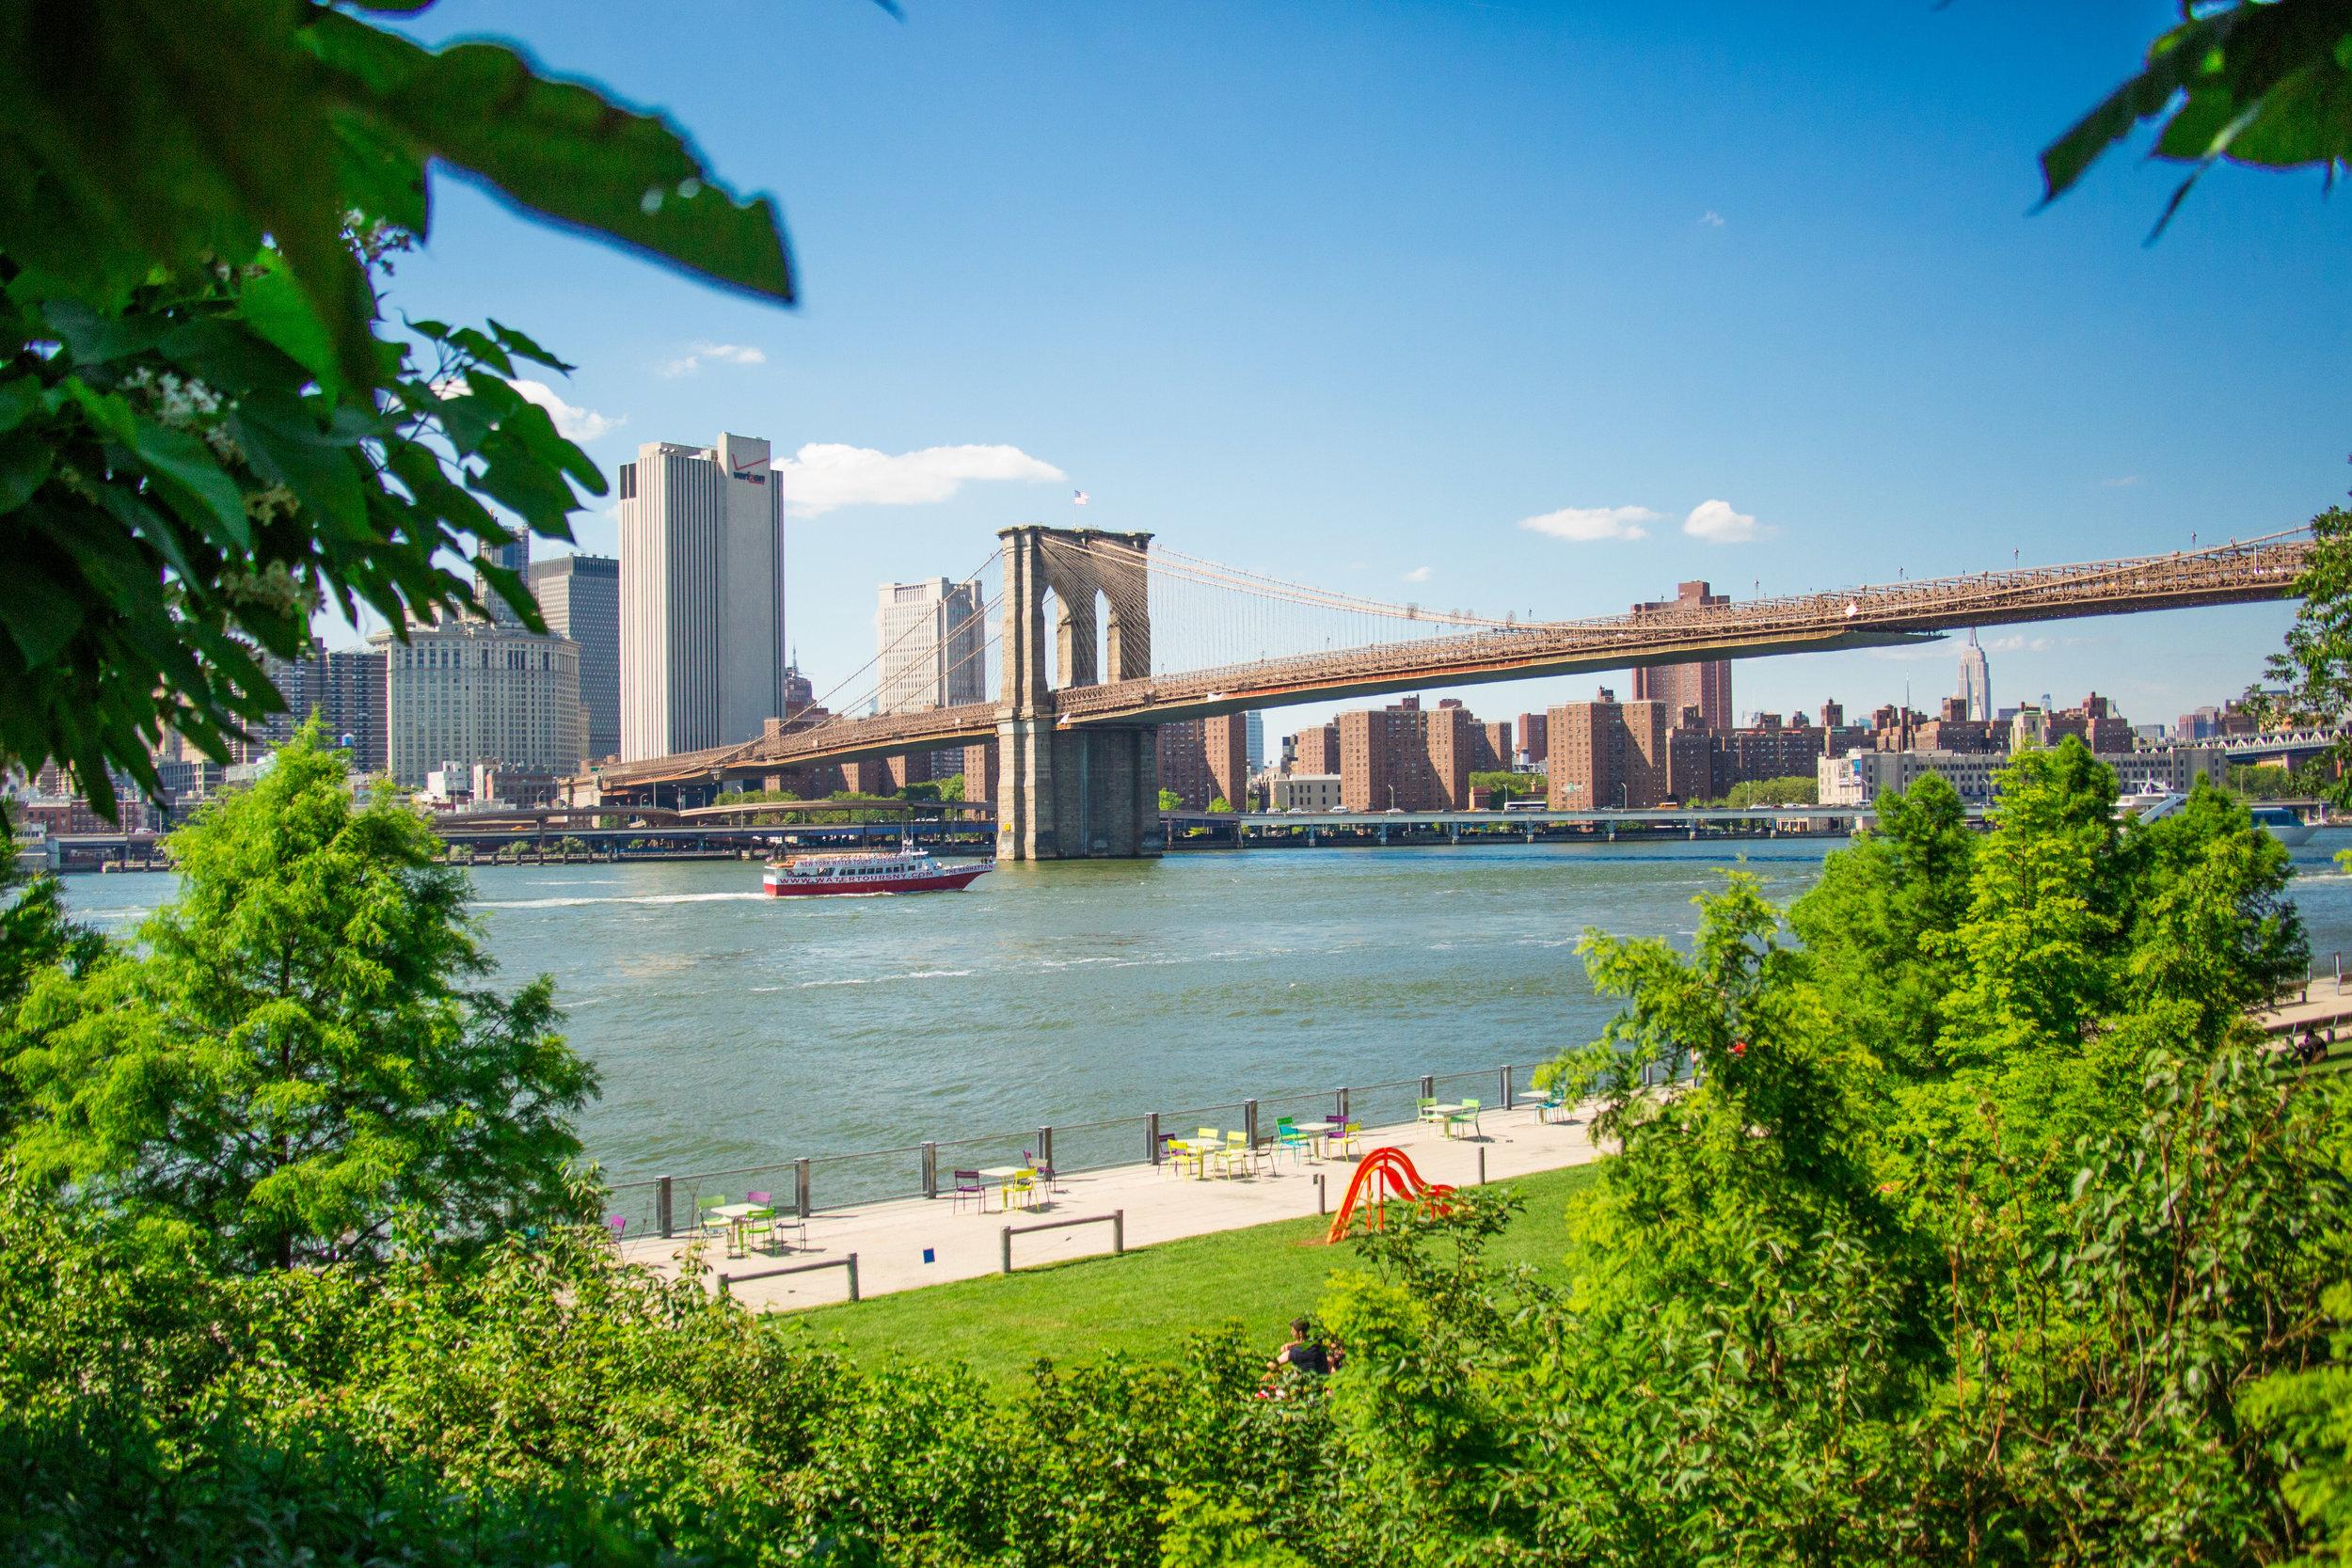 LSNY_Brooklyn_Bridge_Park-73.jpg